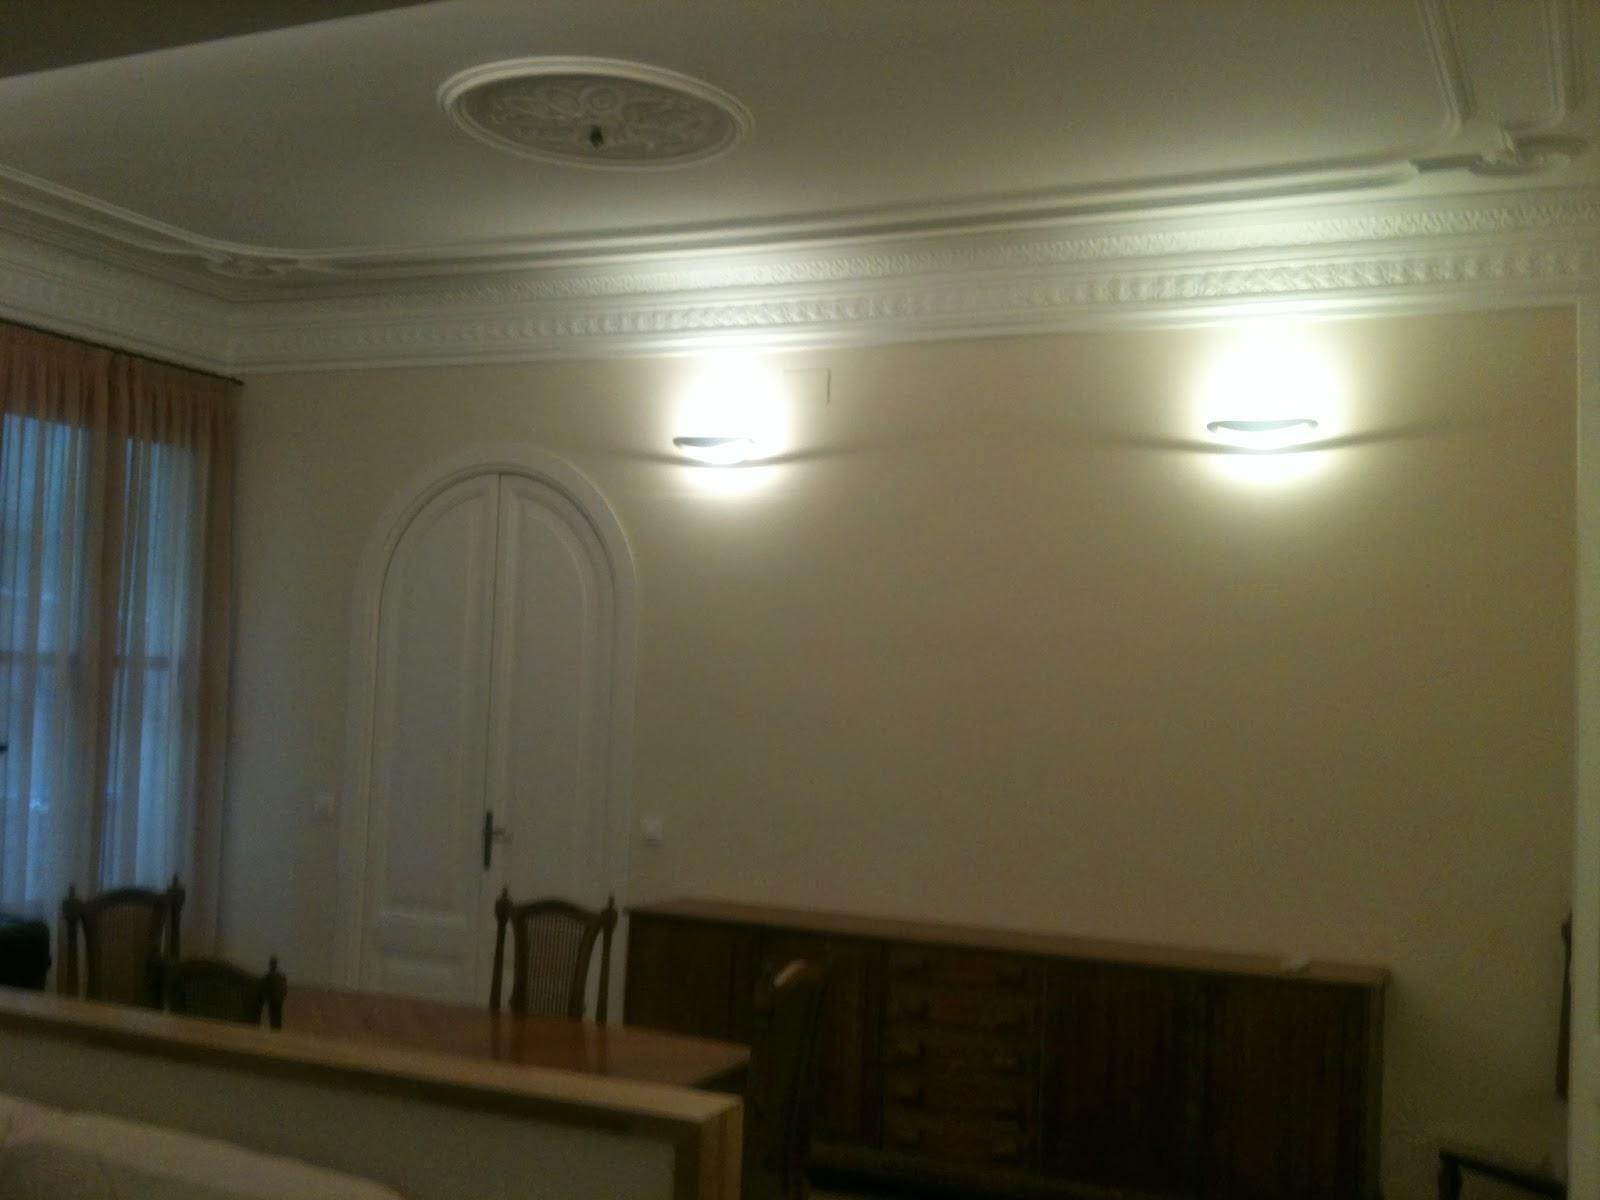 Iluminacion Para Baños Antiguos: Mope, SL: Electricidad e Iluminación de Diseño en rehabilitación